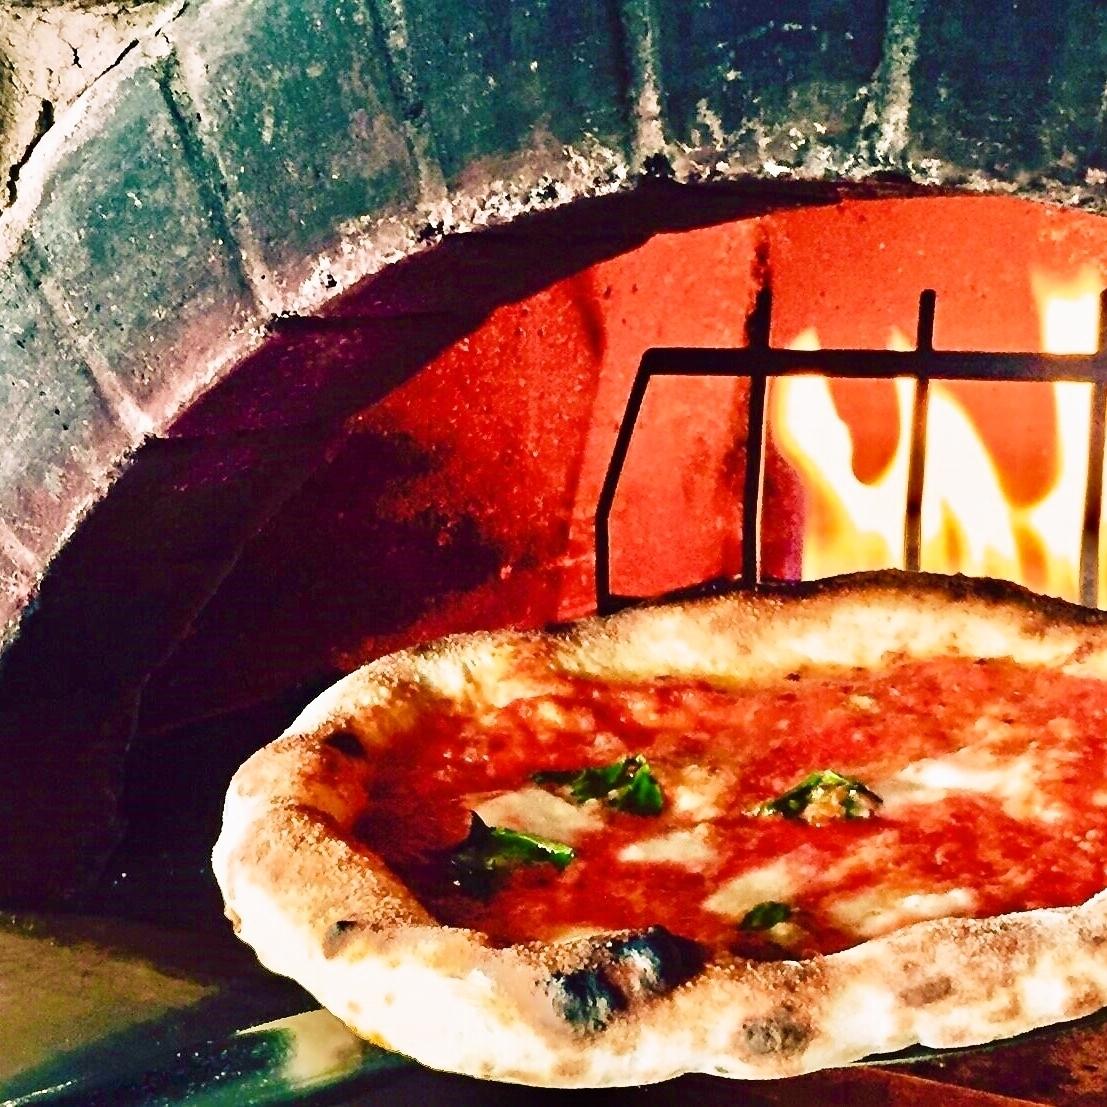 [Stone kiln × pizza] is outstanding!